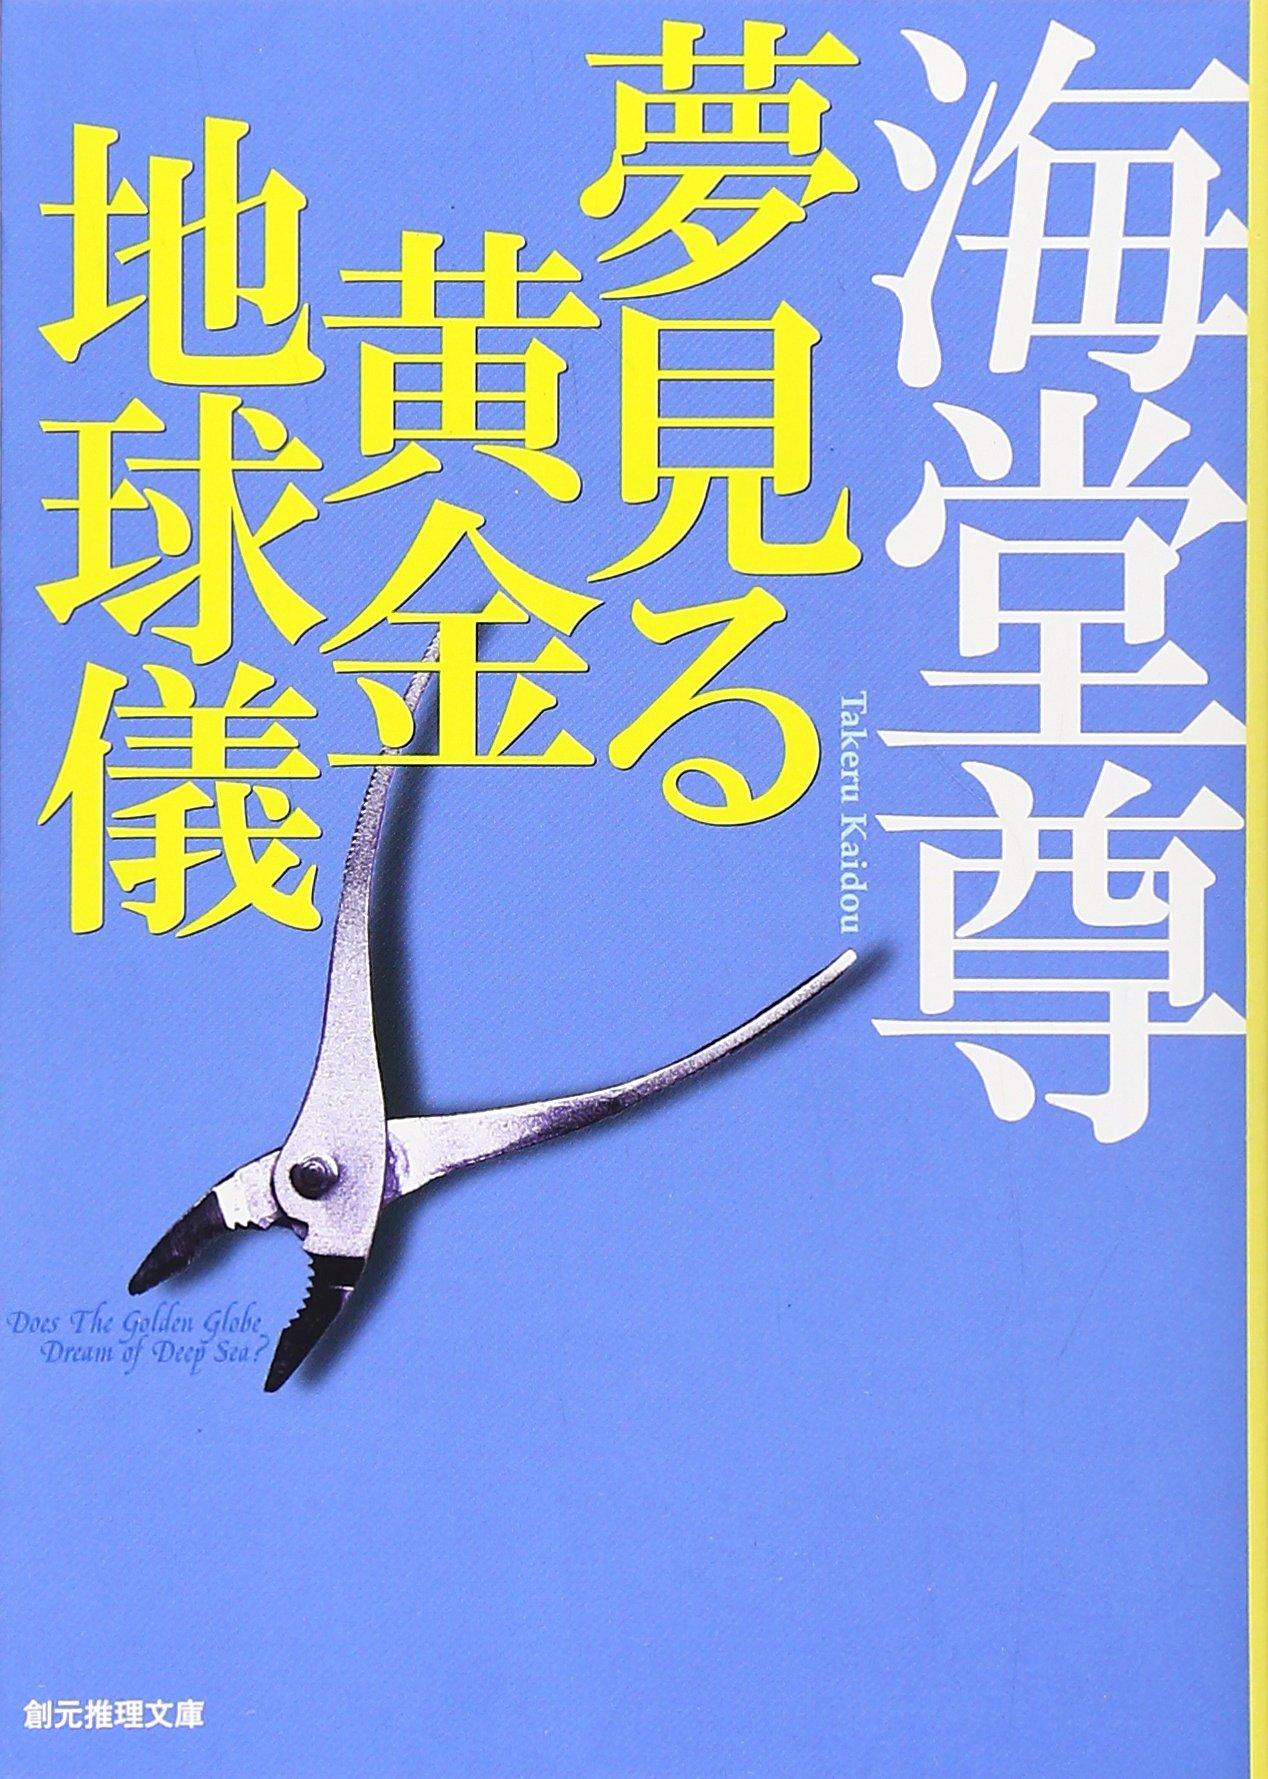 Amazon.co.jp: 医学のたまご (ミステリーYA!): 海堂 尊, ヨシタケ <b>...</b>